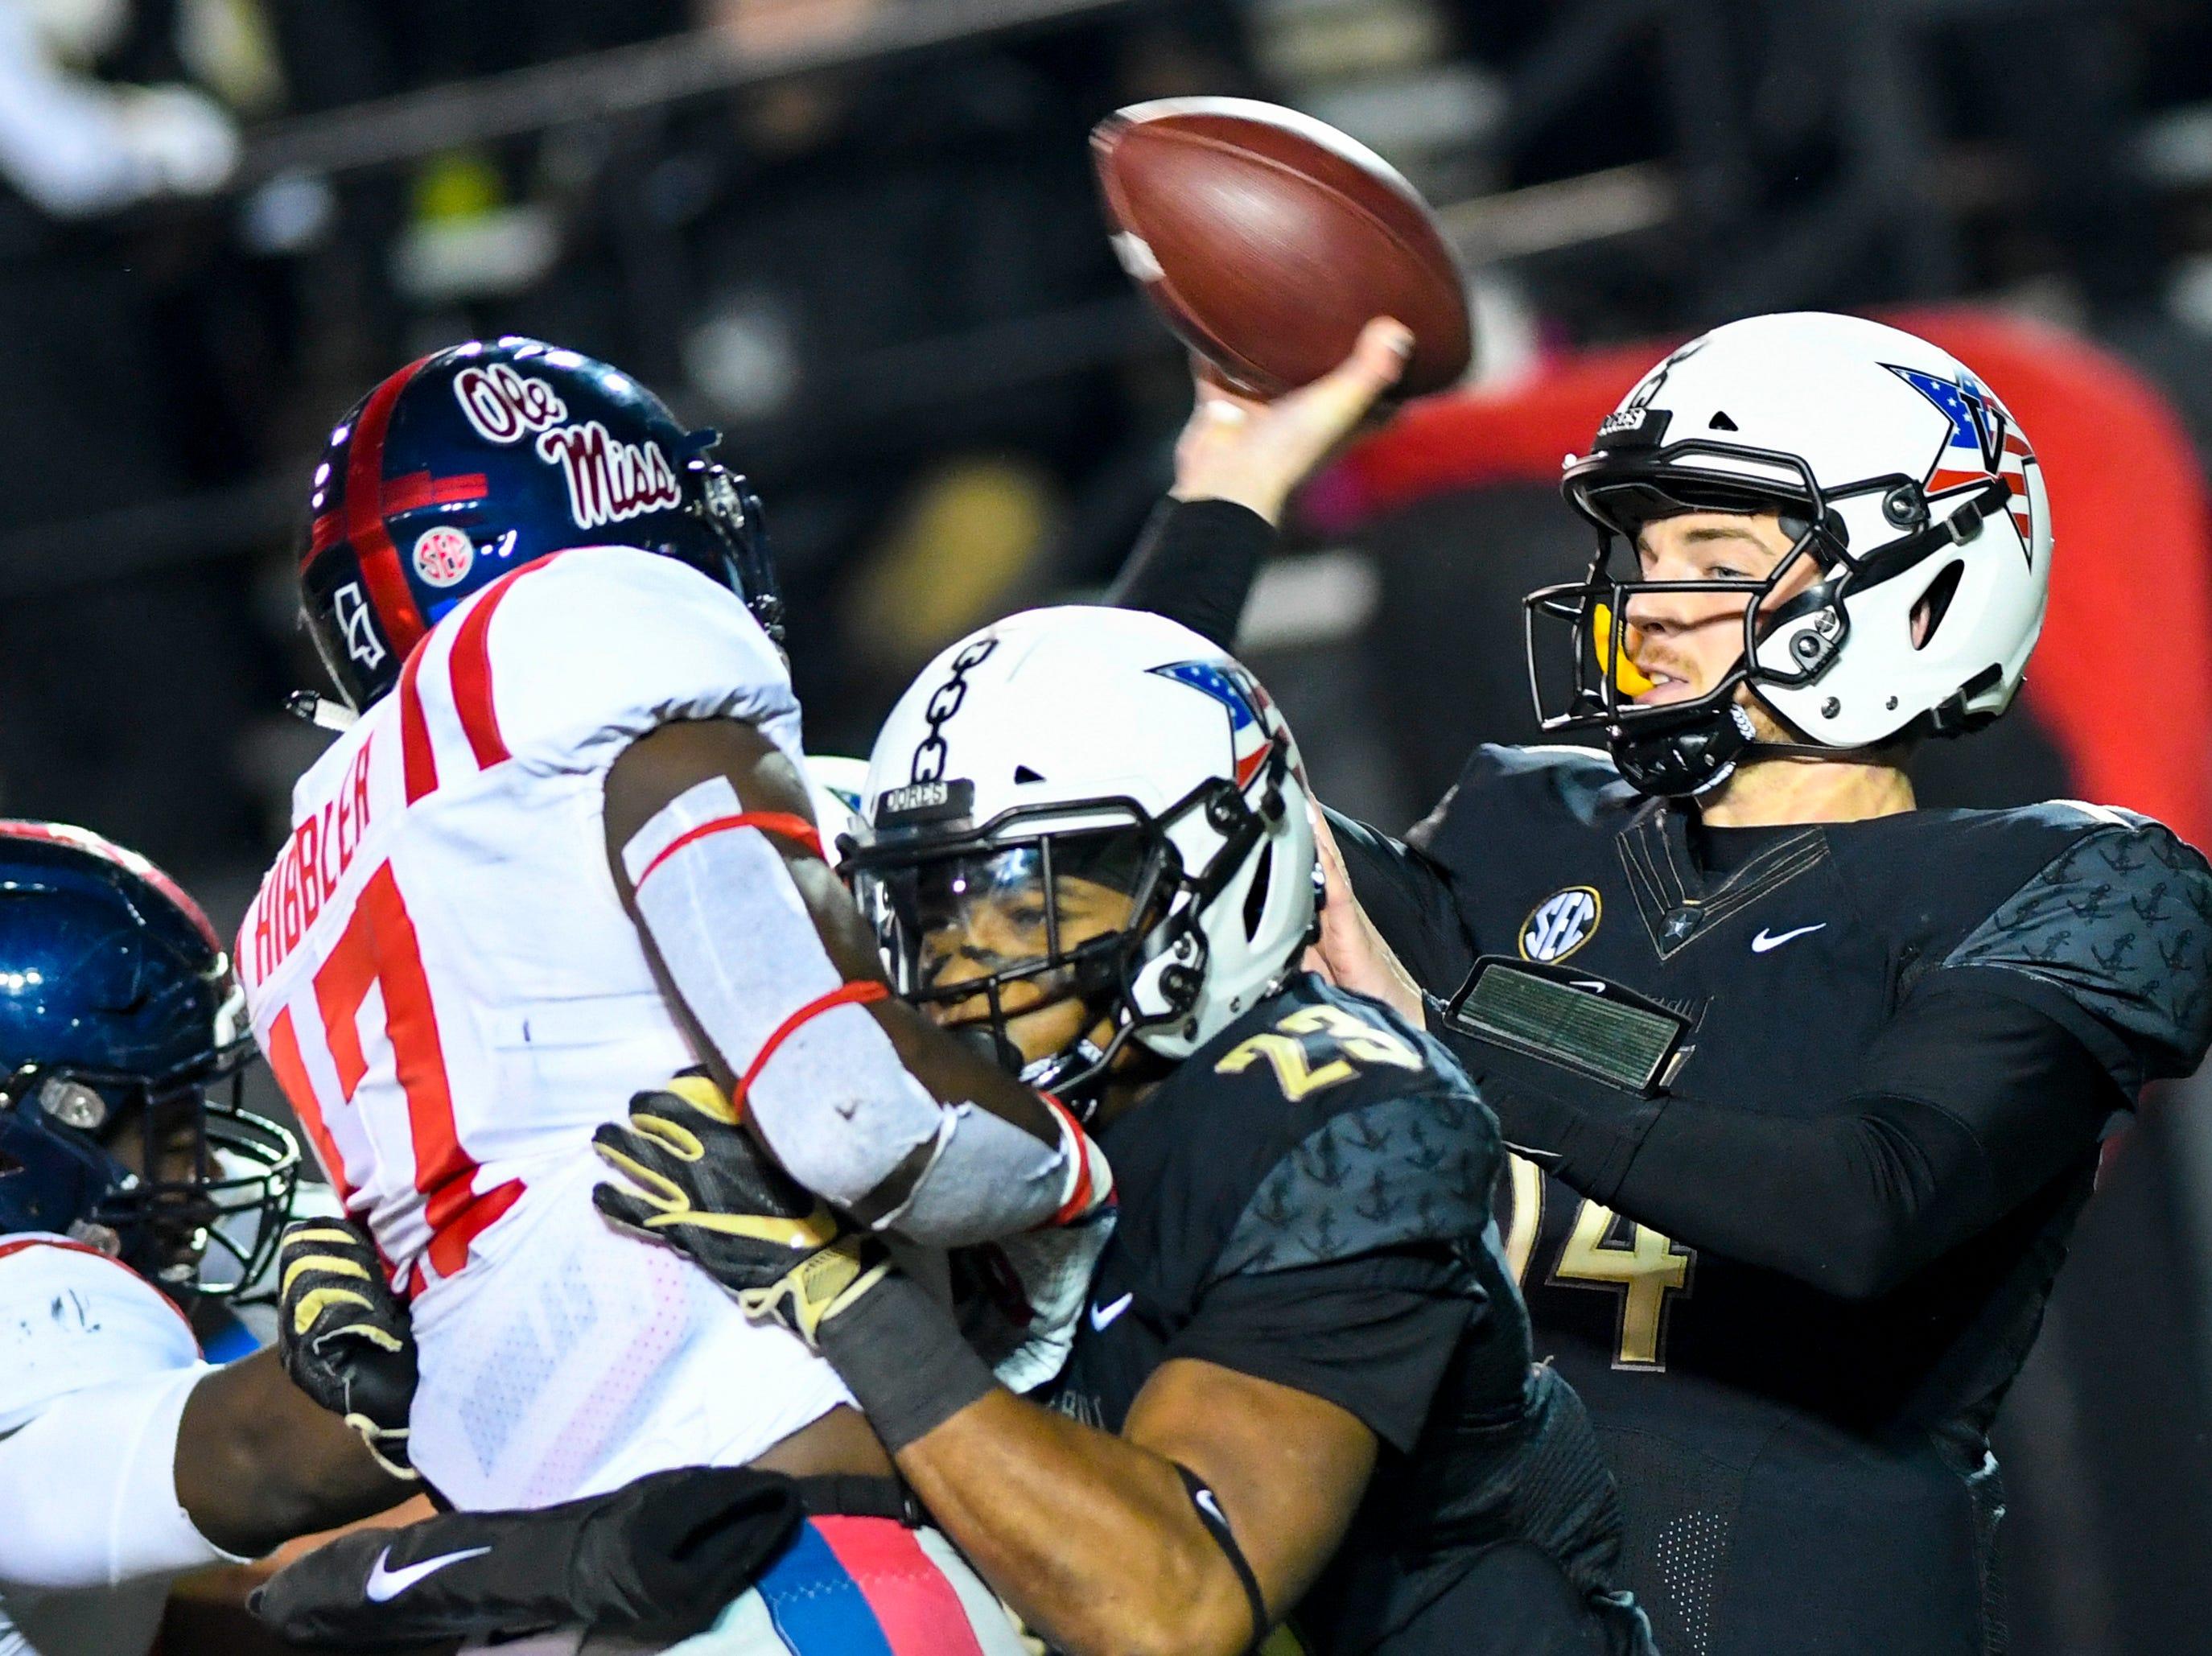 Vanderbilt quarterback Kyle Shurmur (14) passes through traffic during Vanderbilt's game against Ole Miss at Vanderbilt Stadium in Nashville on Saturday, Nov. 17, 2018.